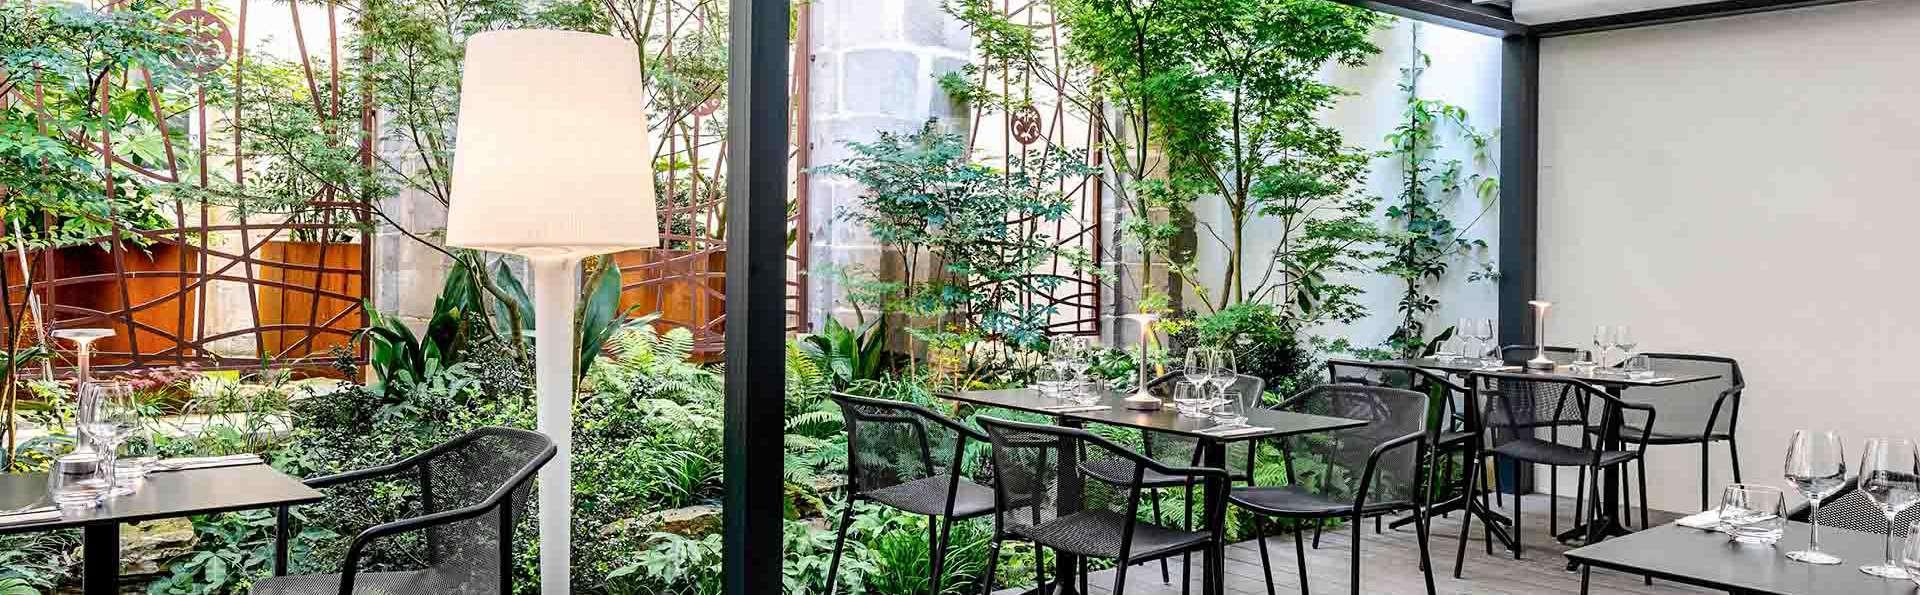 Hôtel Villa Koegui Bayonne - EDIT_lecarre_terrasse_01.jpg